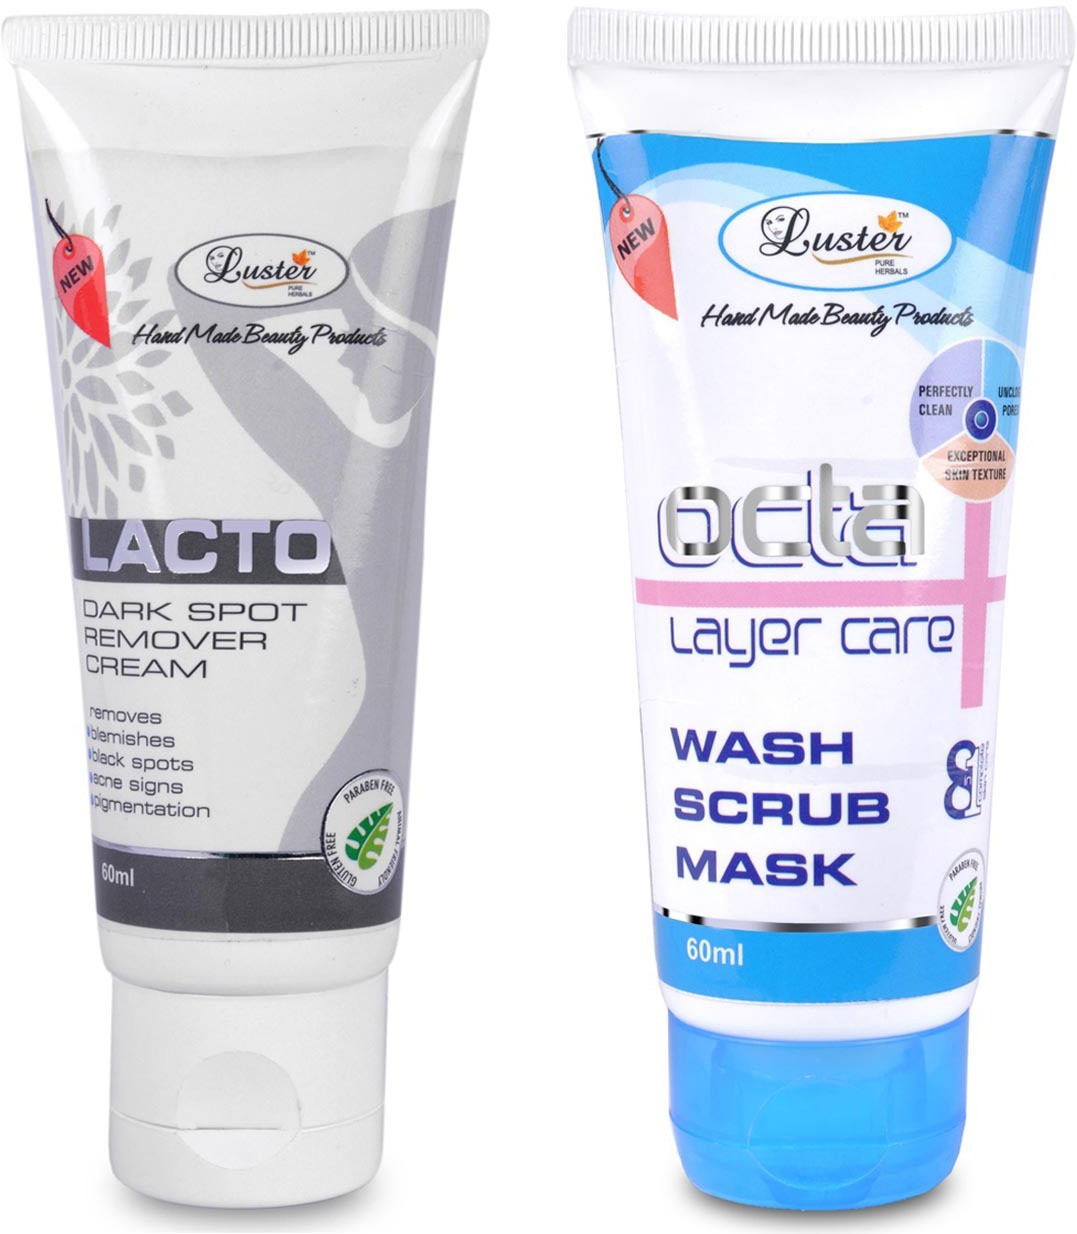 Luster Lacto Dark Spot Remover Cream & Octa Wash Scrub Mask - Instant Facial (Set of 2)(Set of 2)